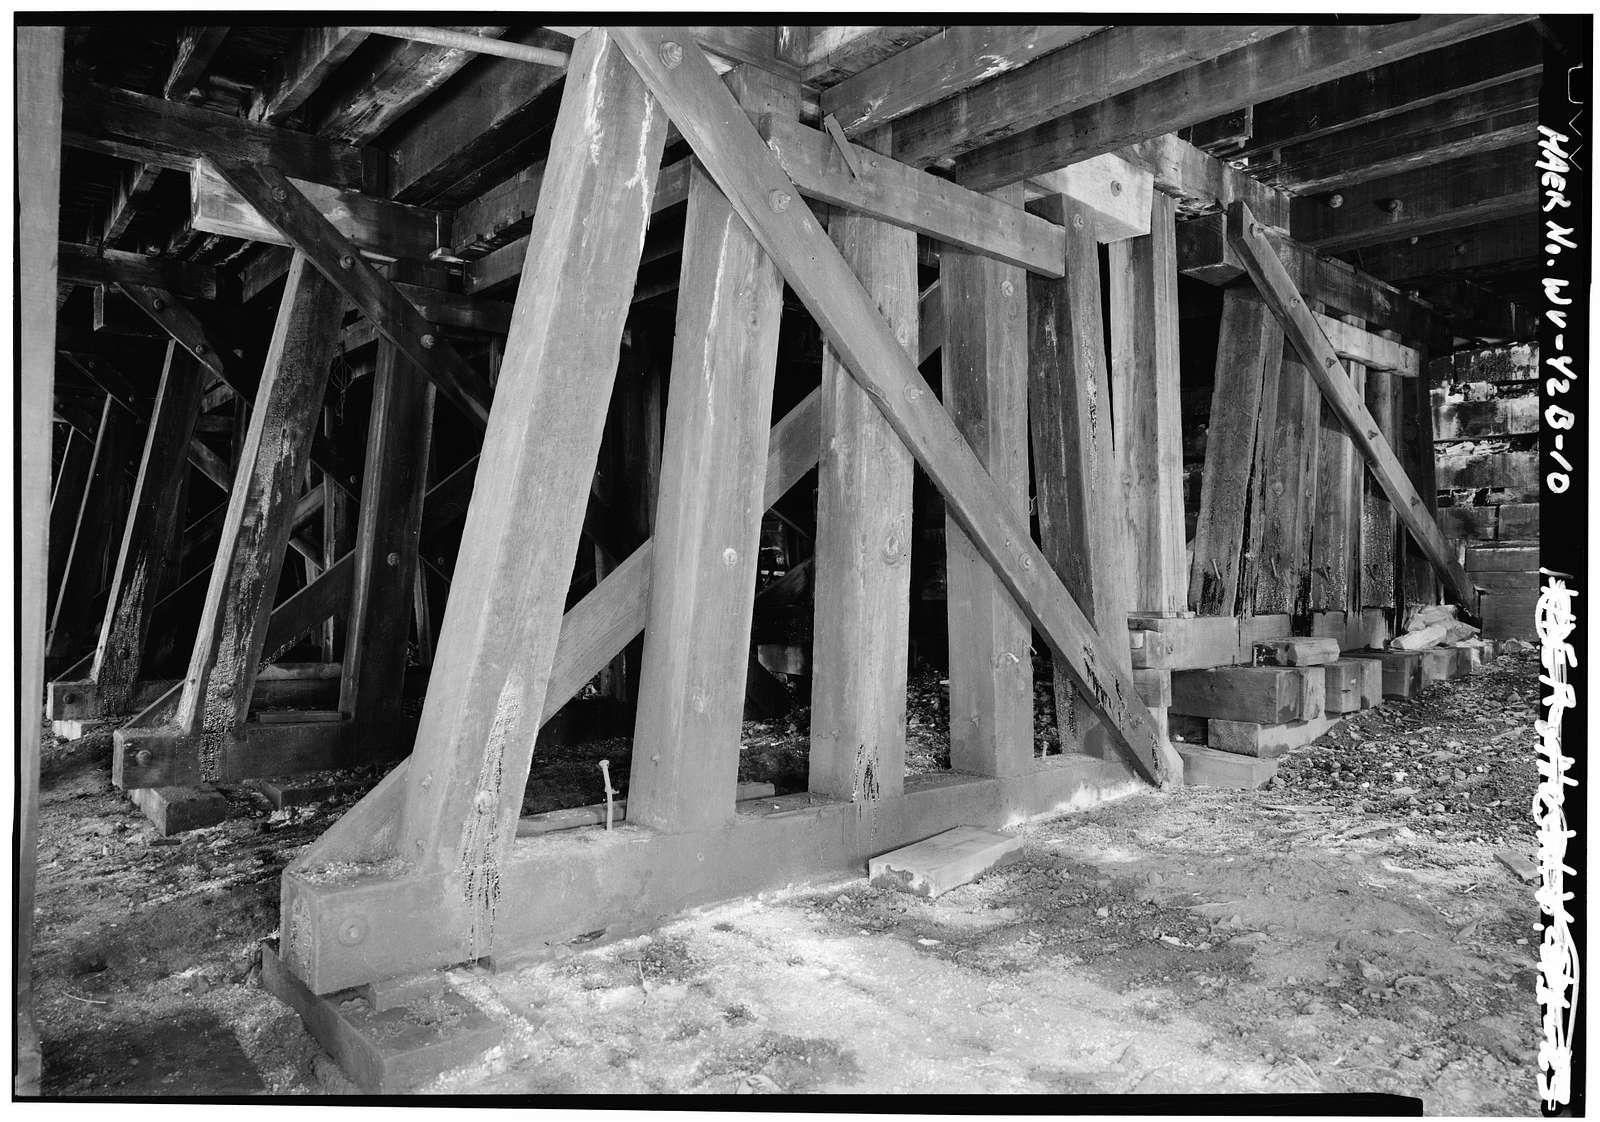 Chesapeake & Ohio Railroad, Engine House, Along south end Thurmond, west of New River Bridge, Thurmond, Fayette County, WV